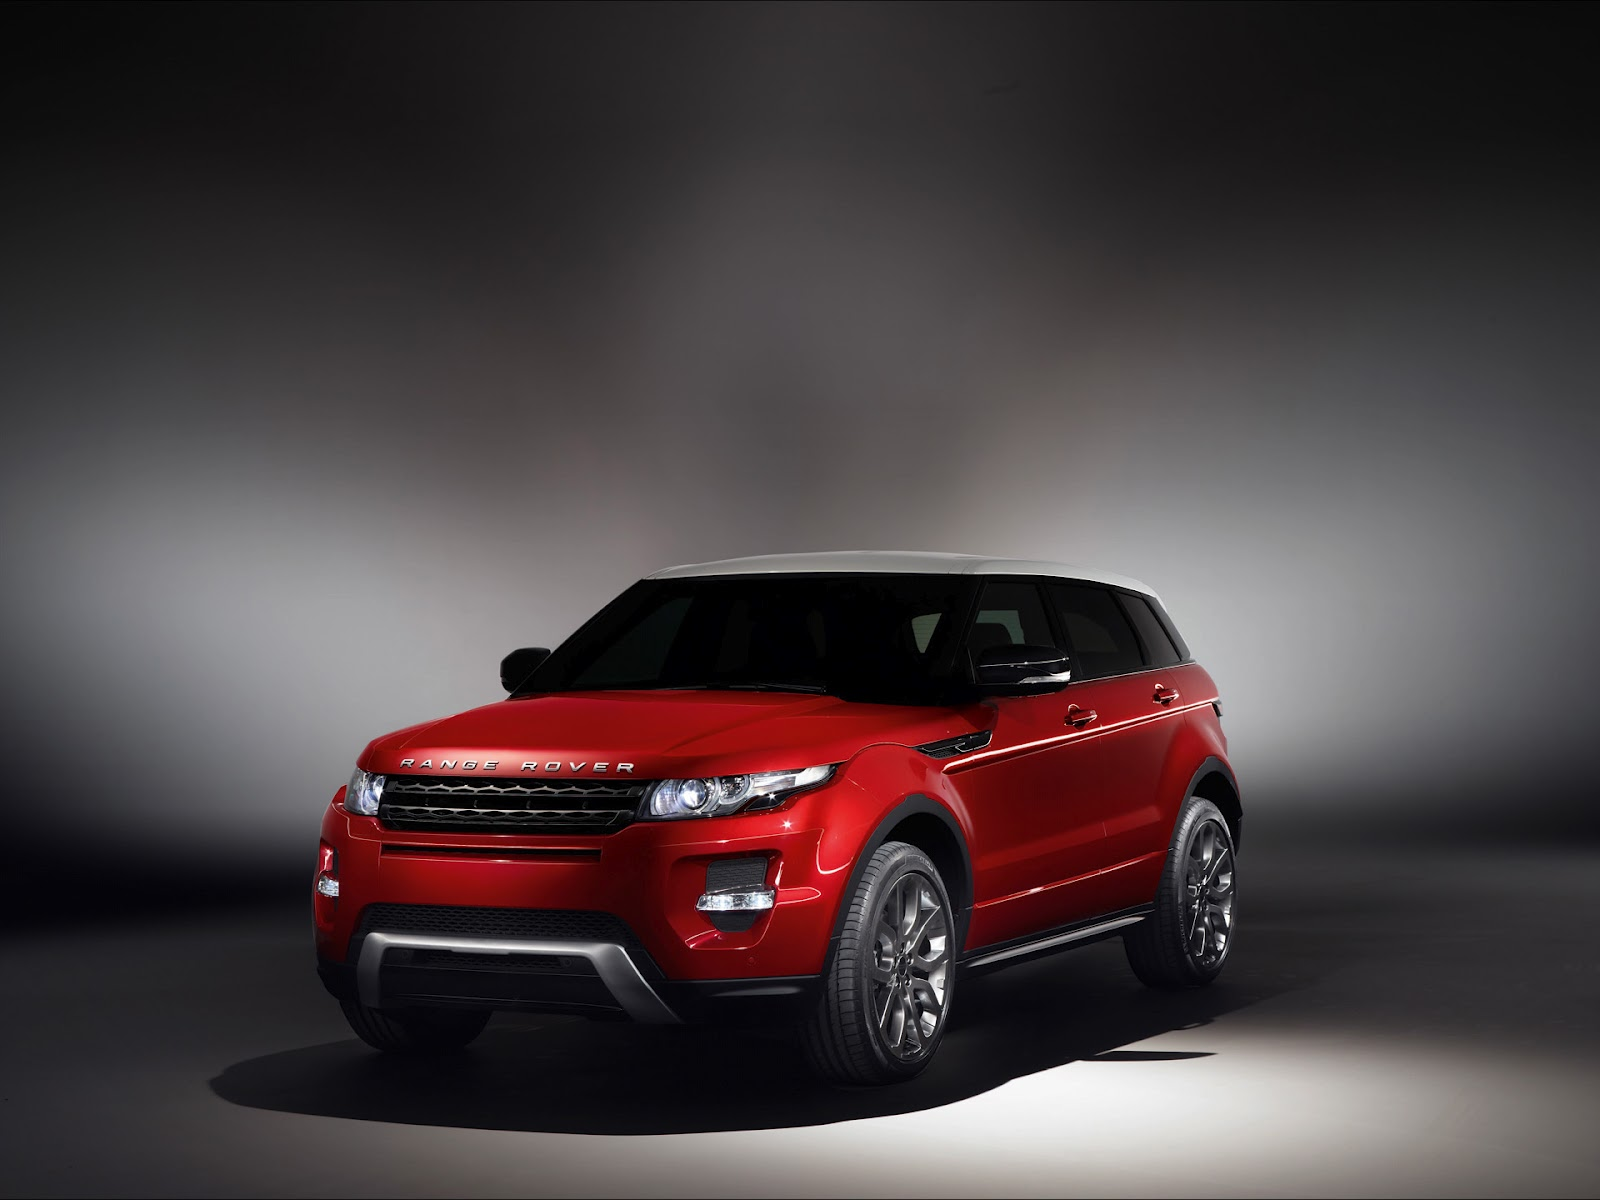 top 10 range rover evoque full hd wallpapers best range. Black Bedroom Furniture Sets. Home Design Ideas